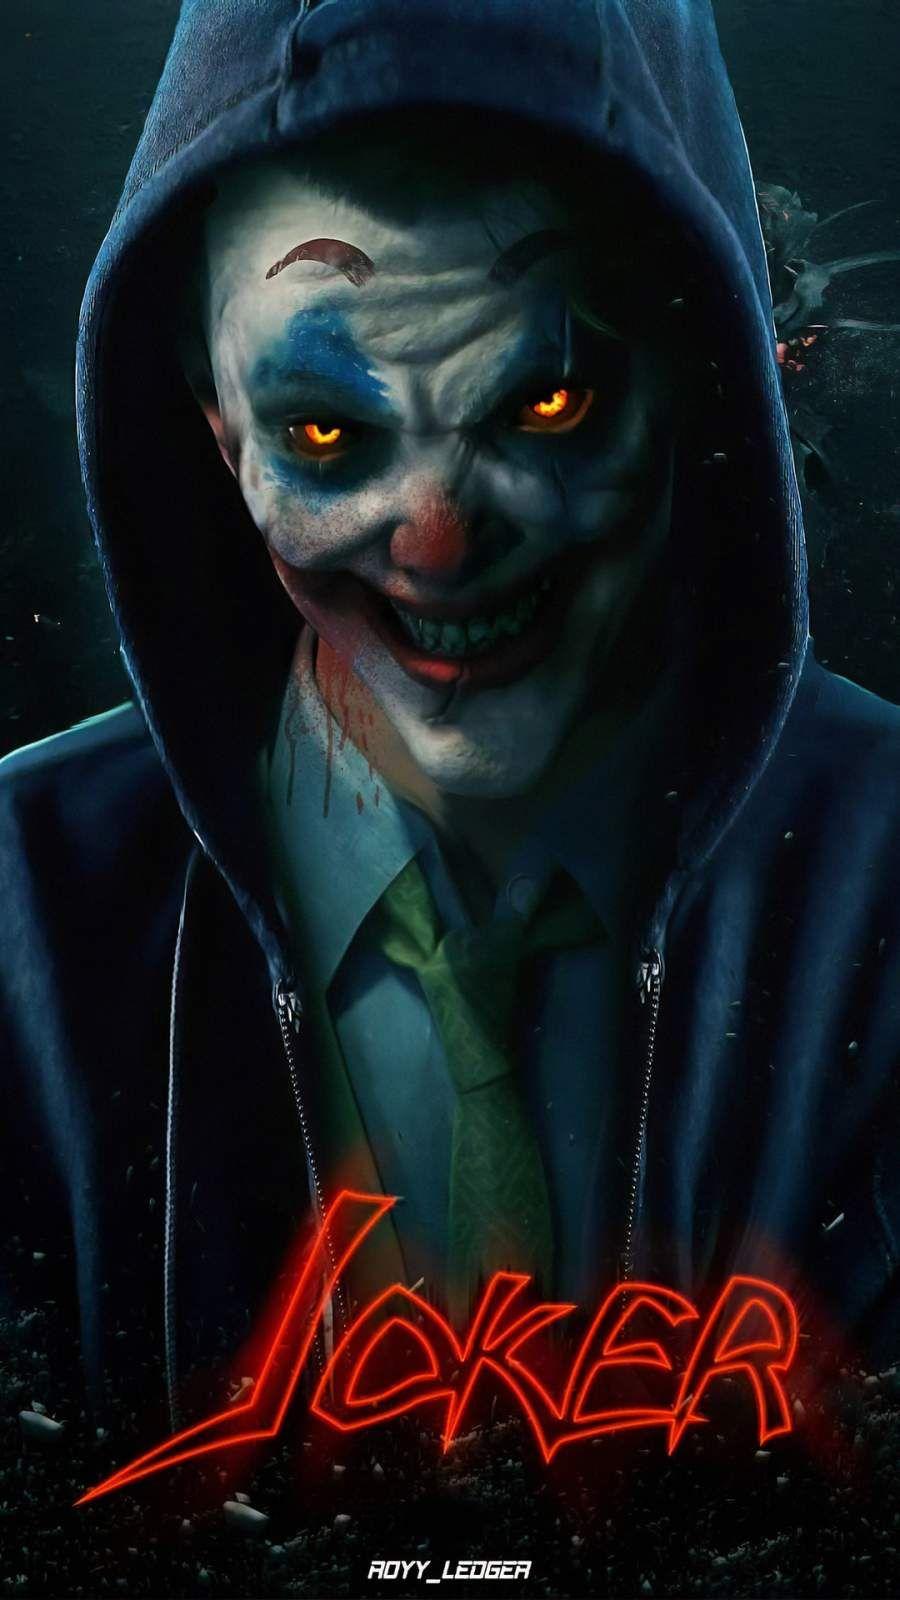 Scary Joker Iphone Wallpaper Joker Iphone Wallpaper Joker Artwork Joker Wallpapers